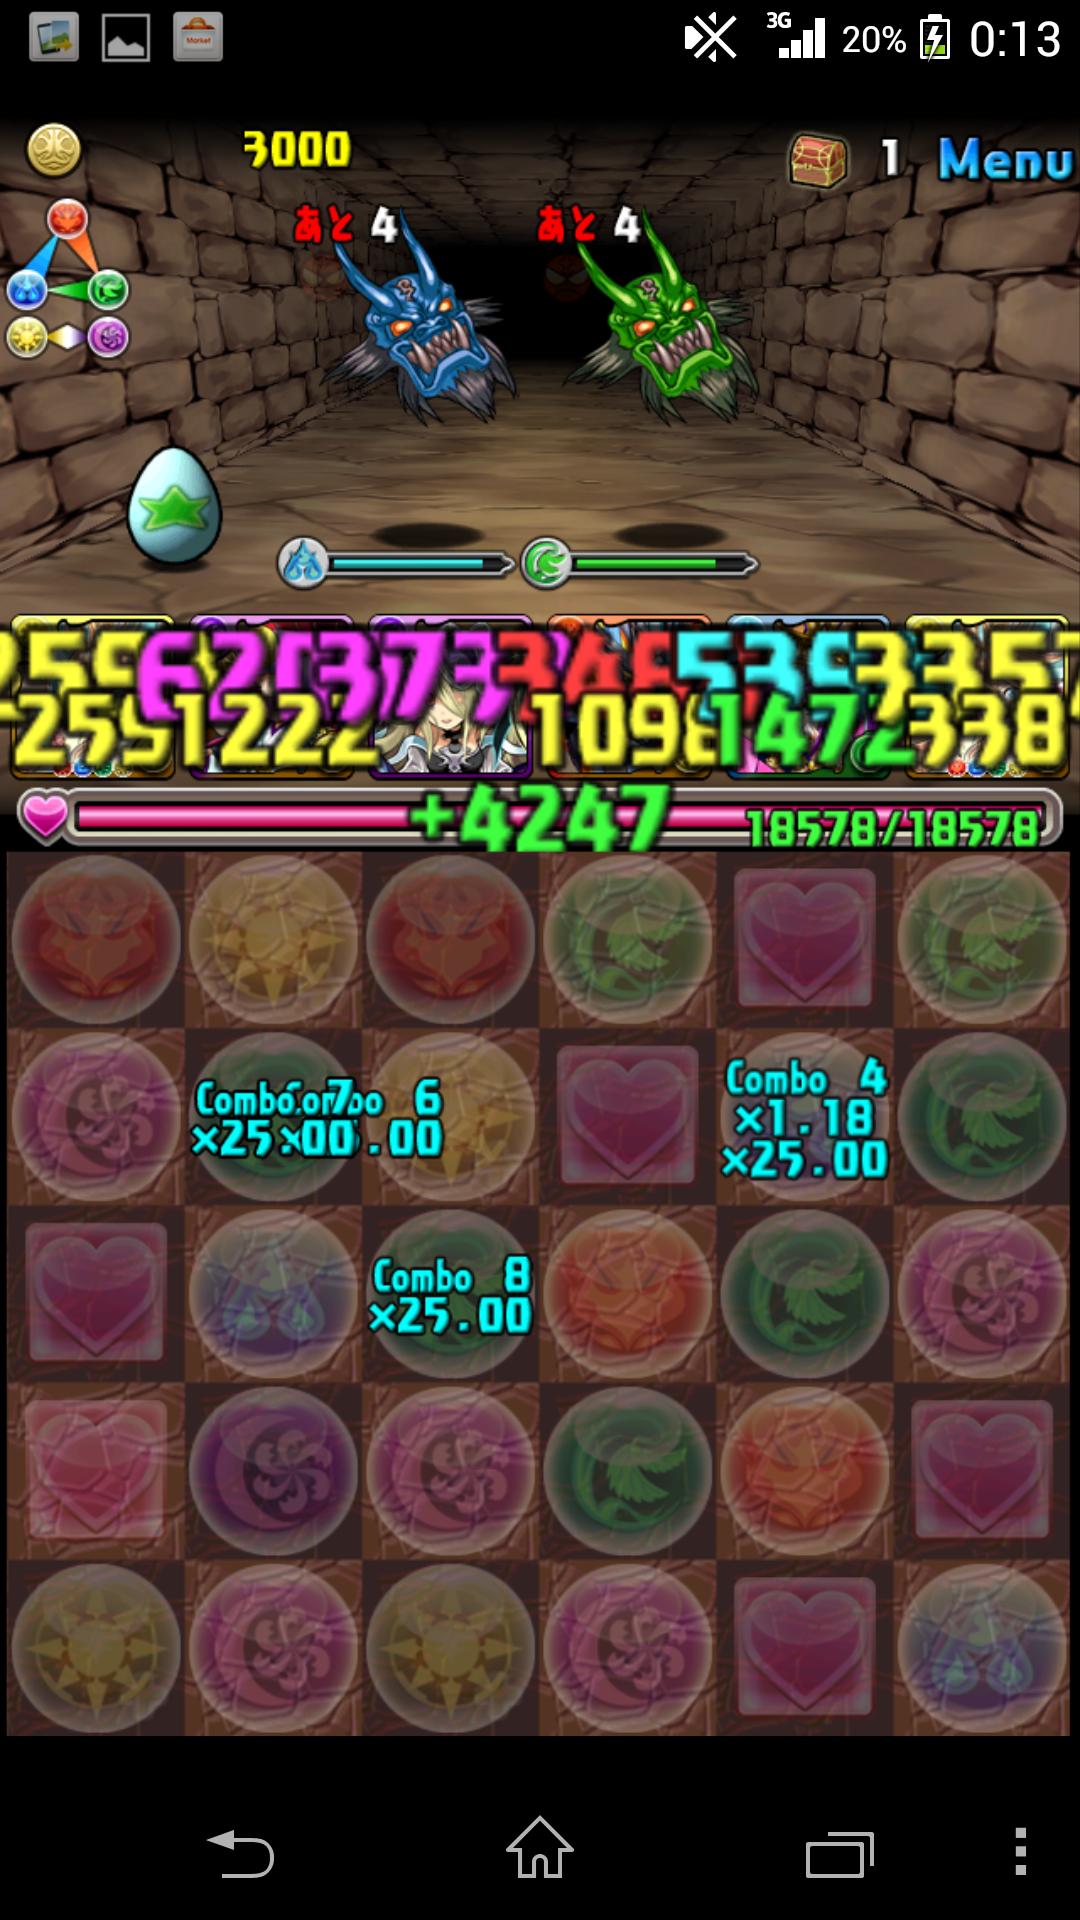 Screenshot_2014-05-07-00-13-39.png